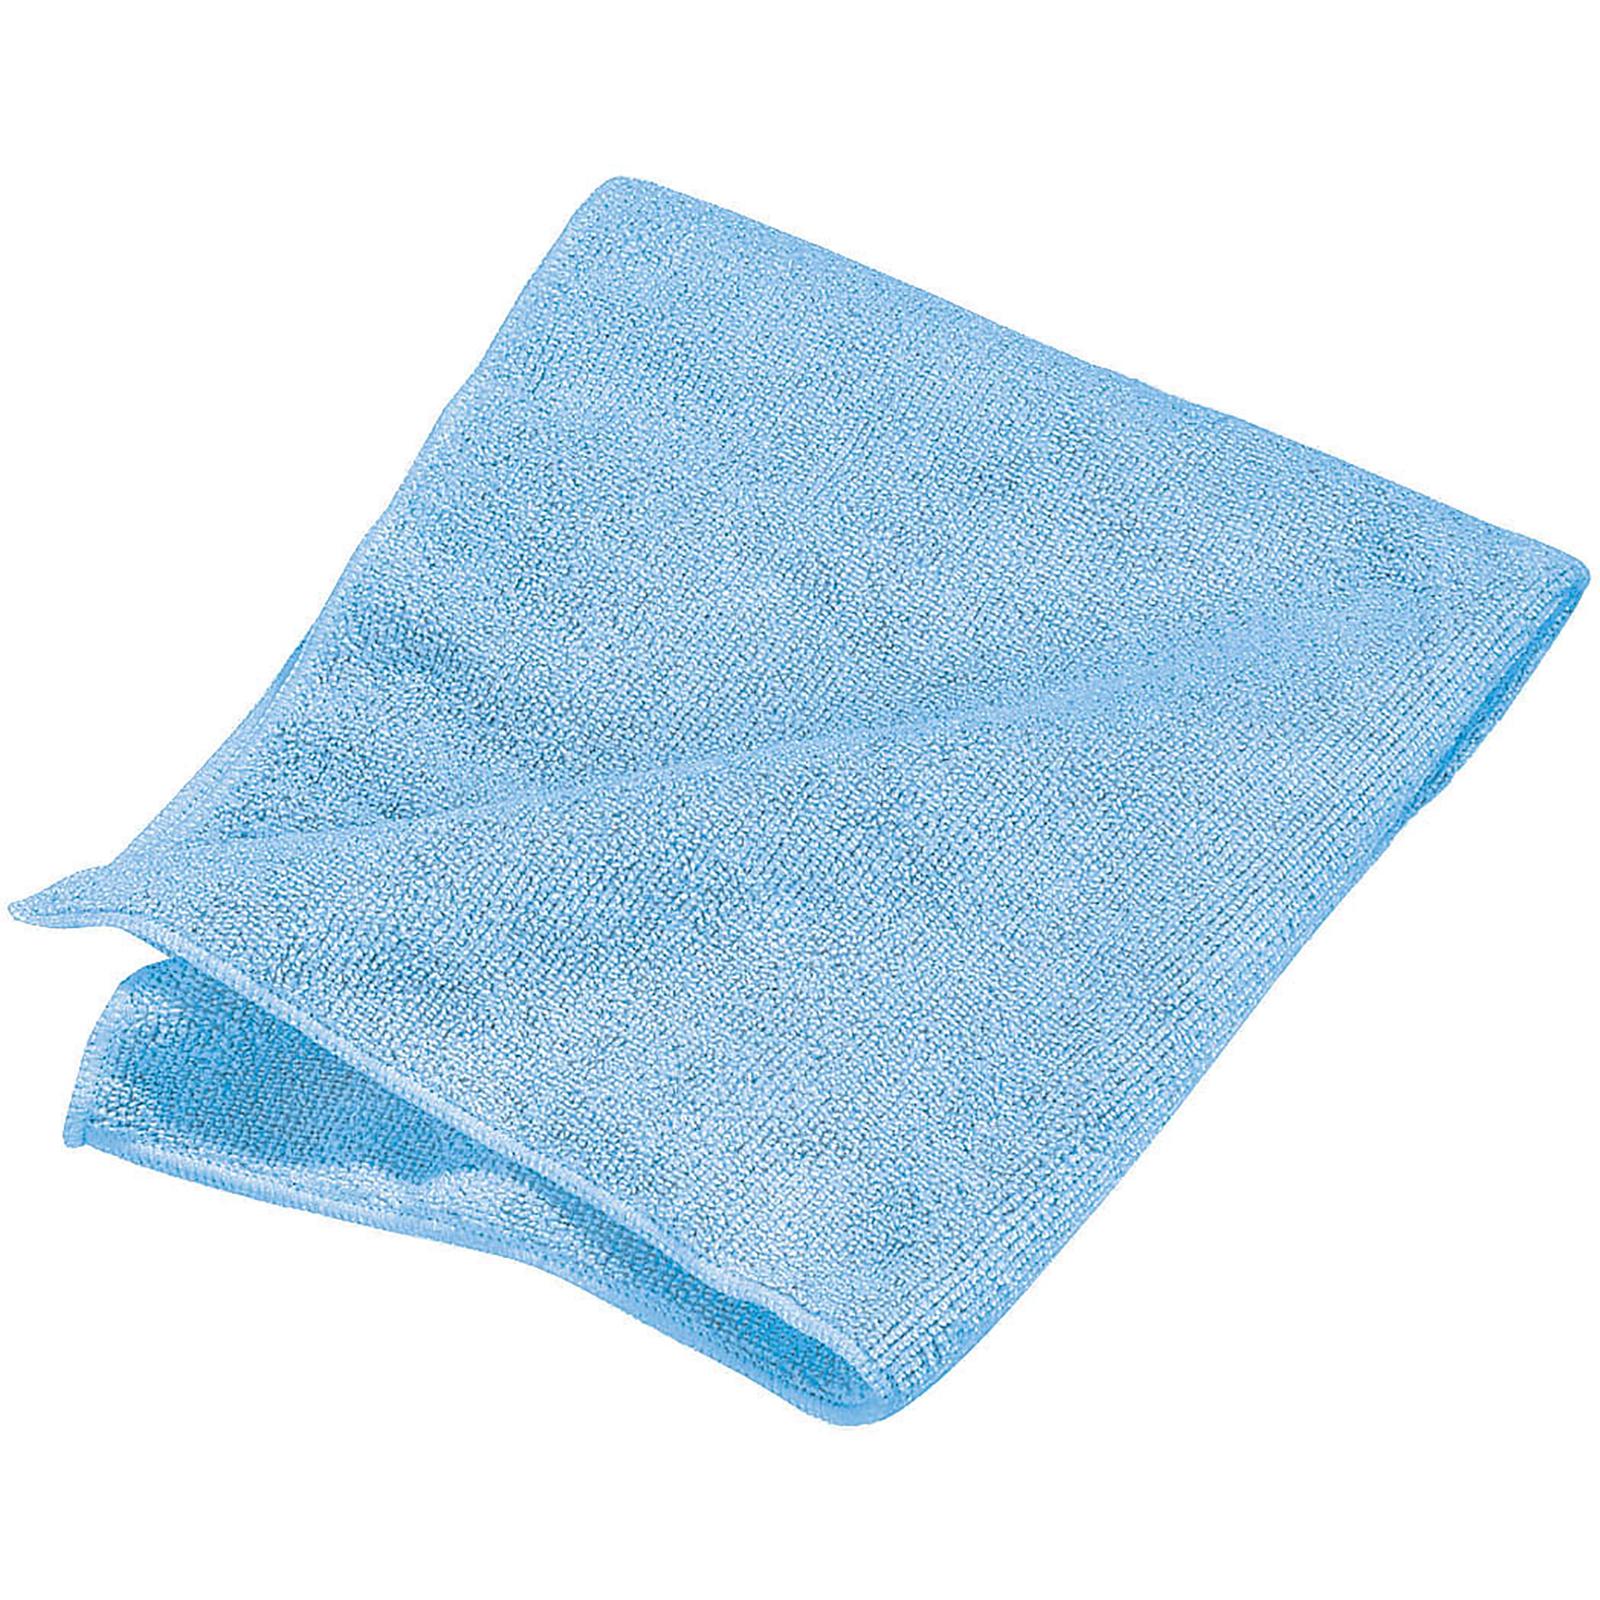 Carlisle 3633414 towel / cloth / mitts, microfiber